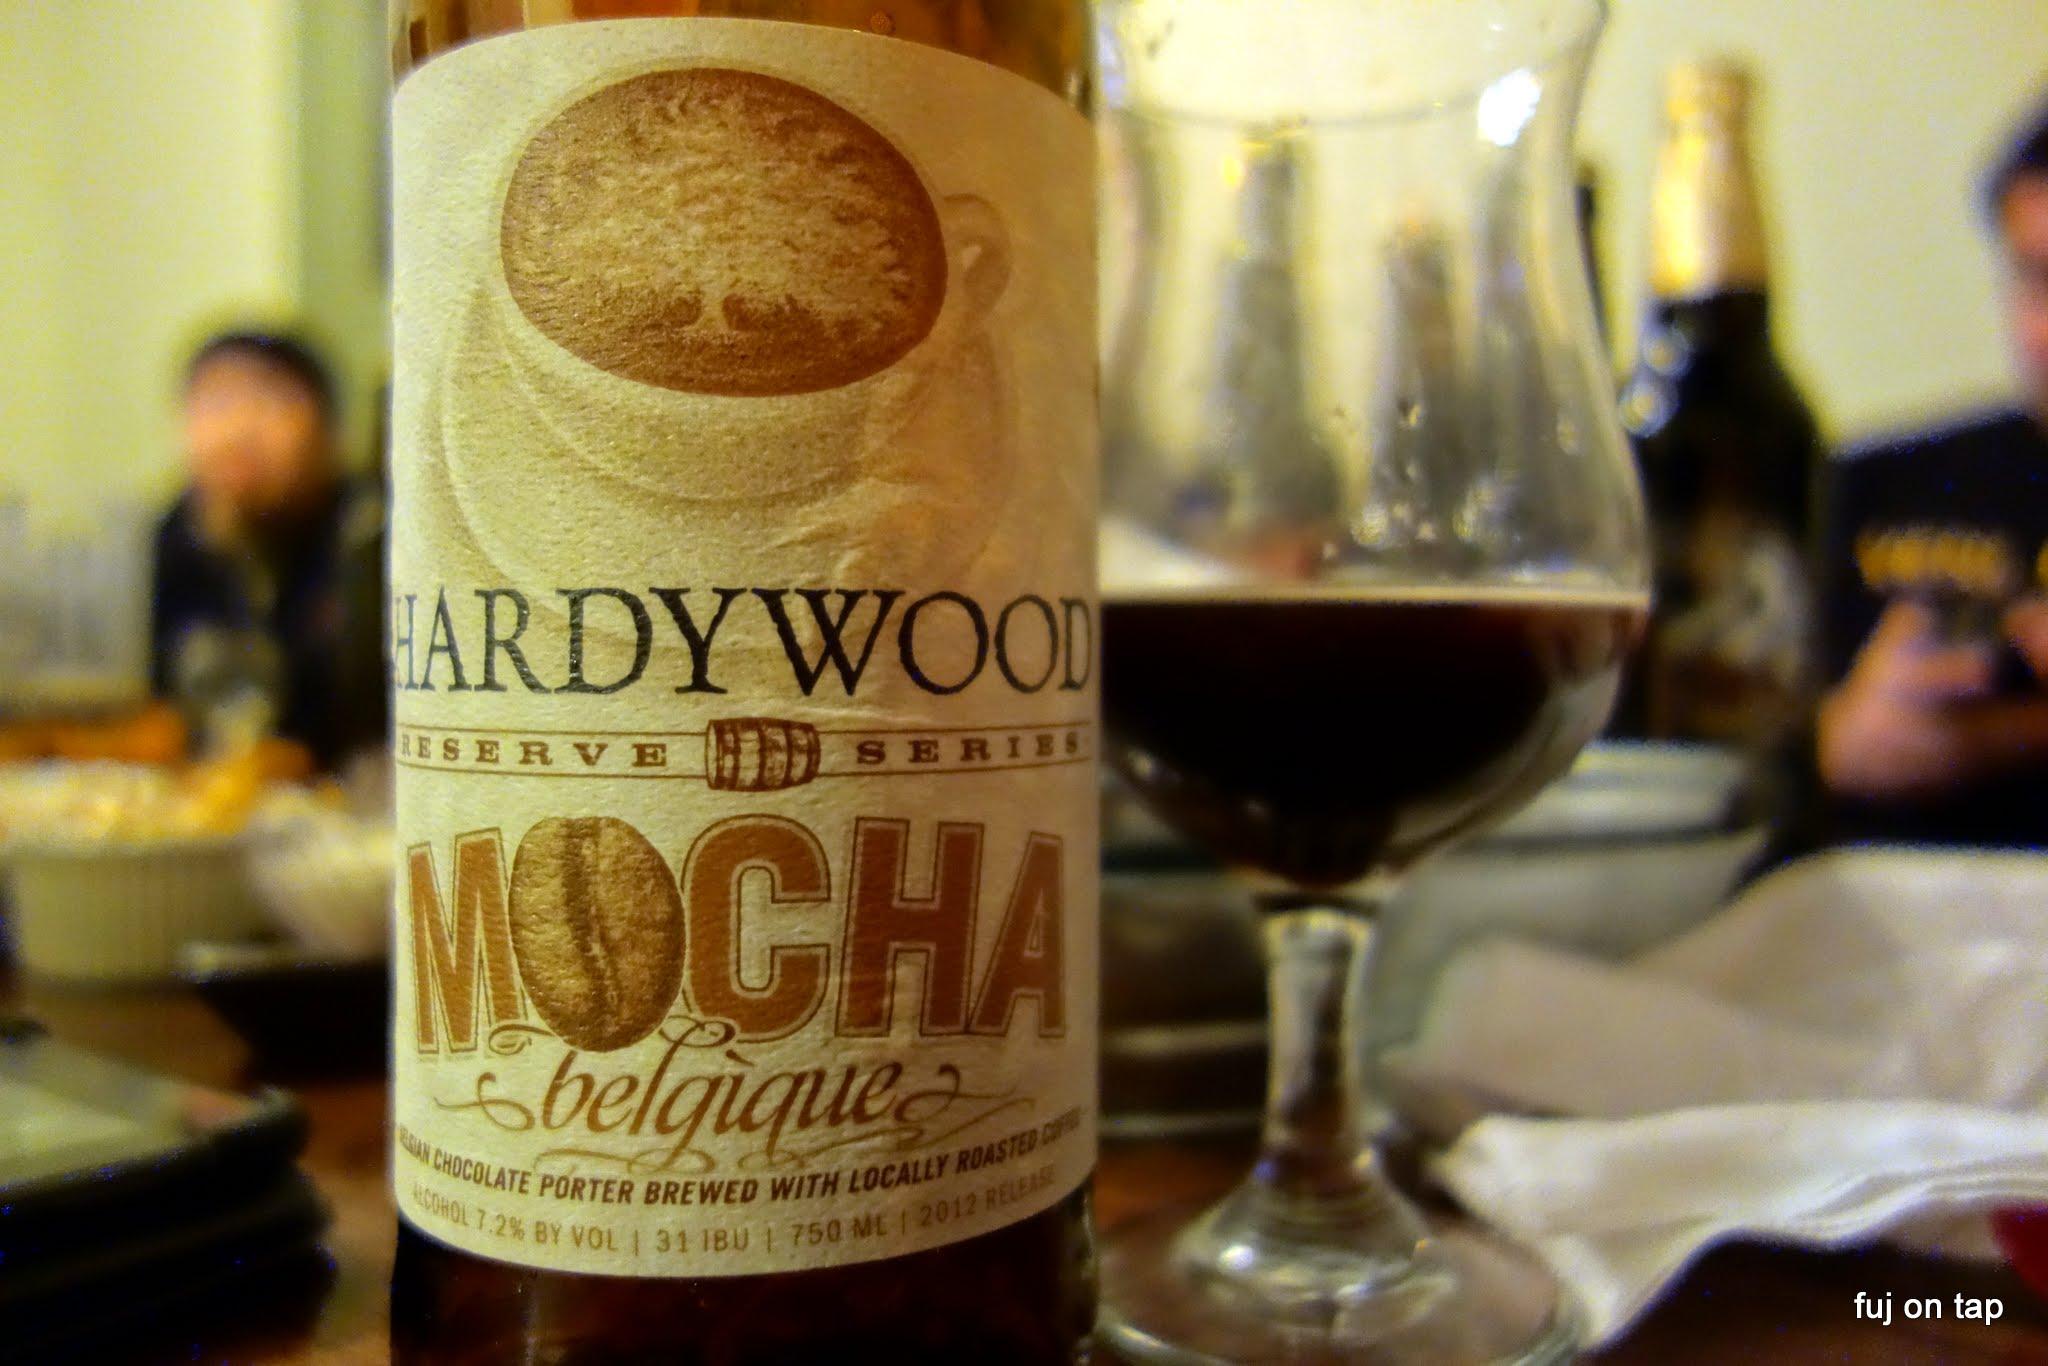 Hardywood Mocha Belgique